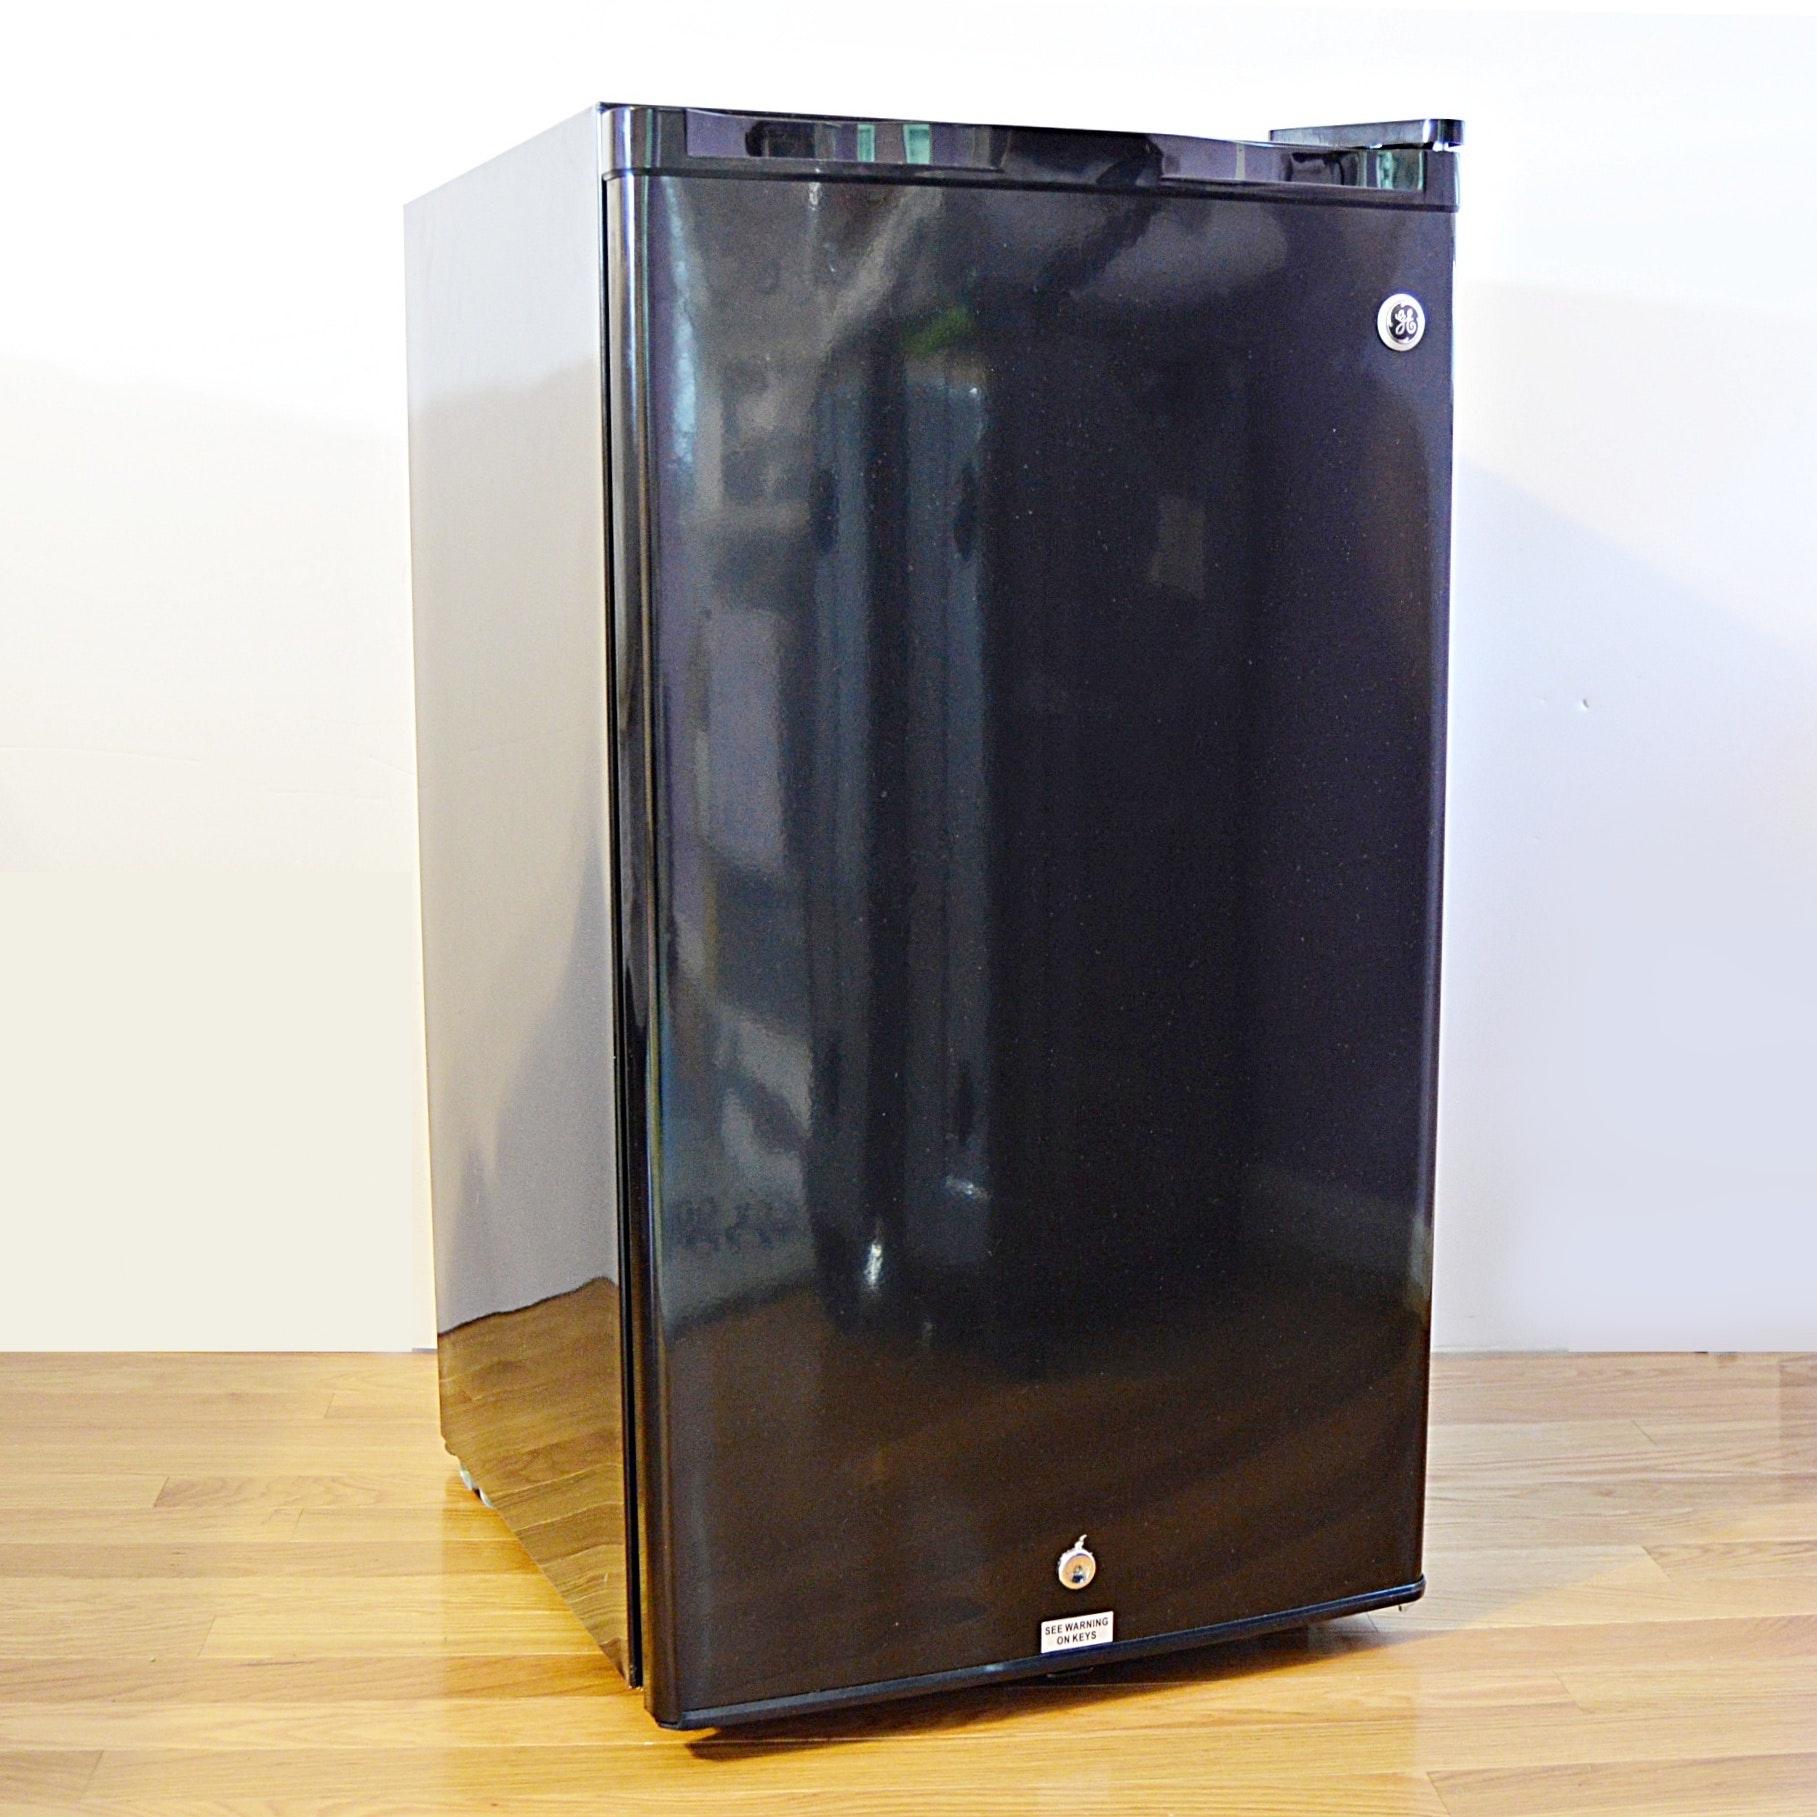 GE Miniature Refrigerator